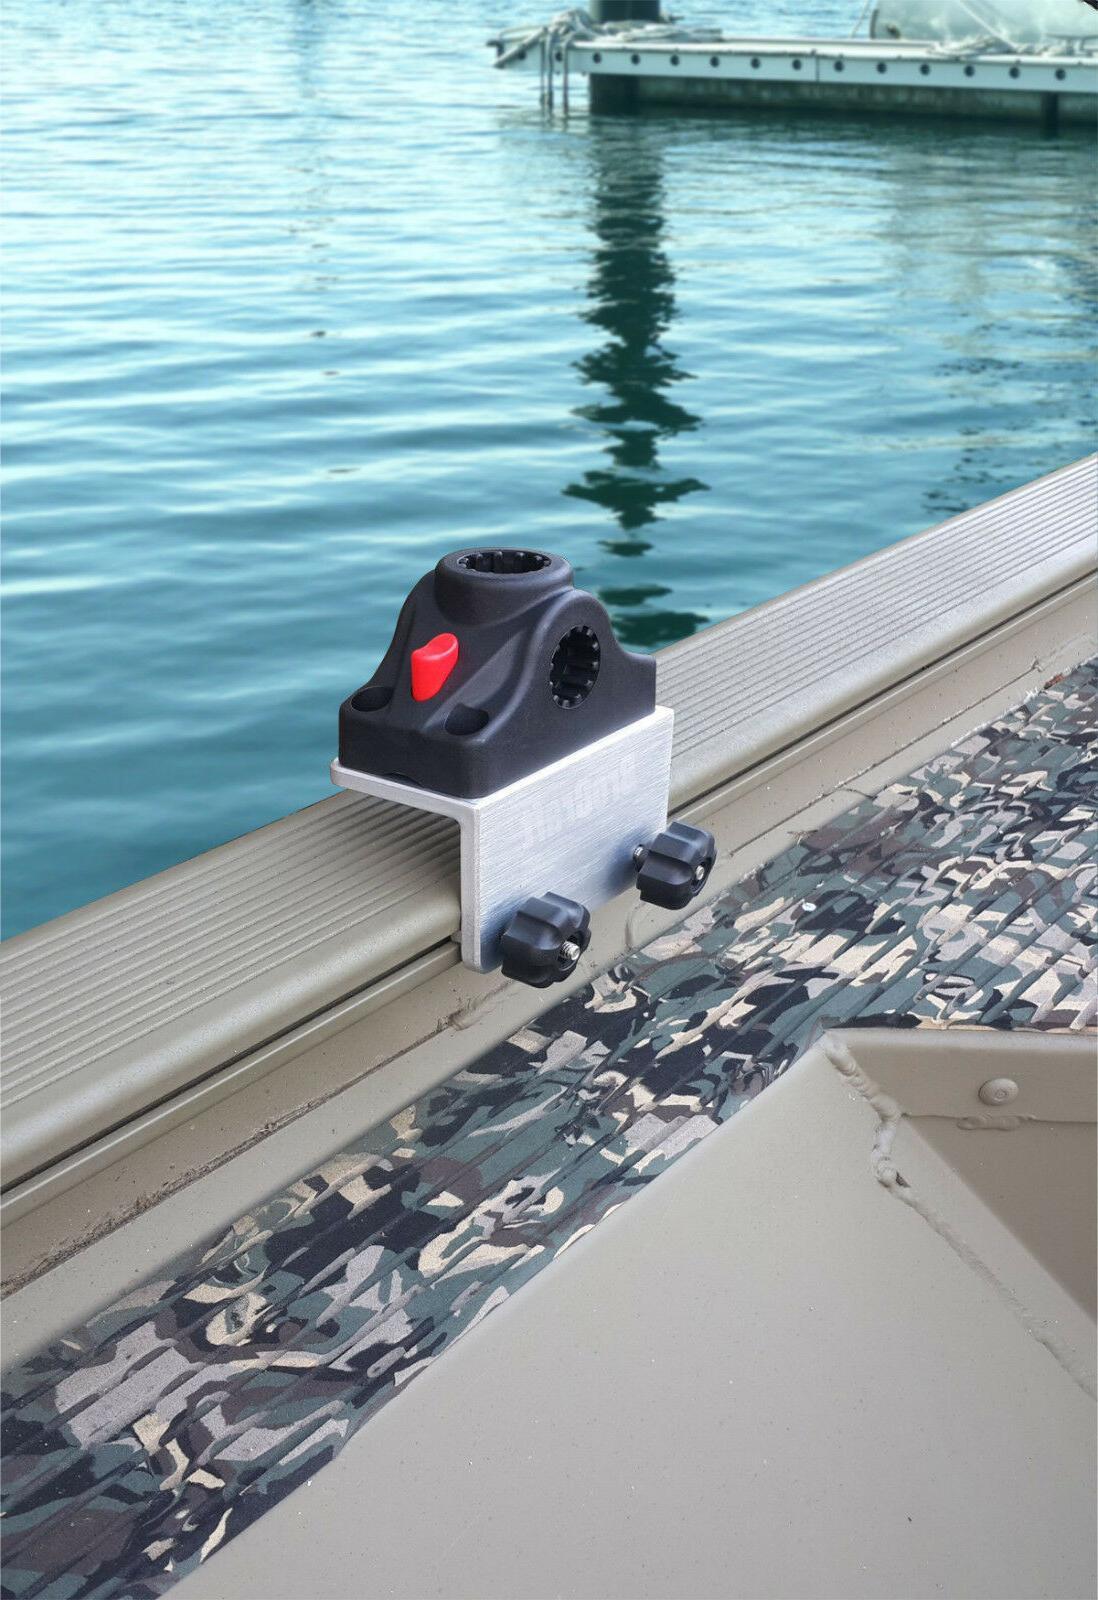 Brocraft Tracker Versatrack System/Lund Sport Bait/Fillet Table board